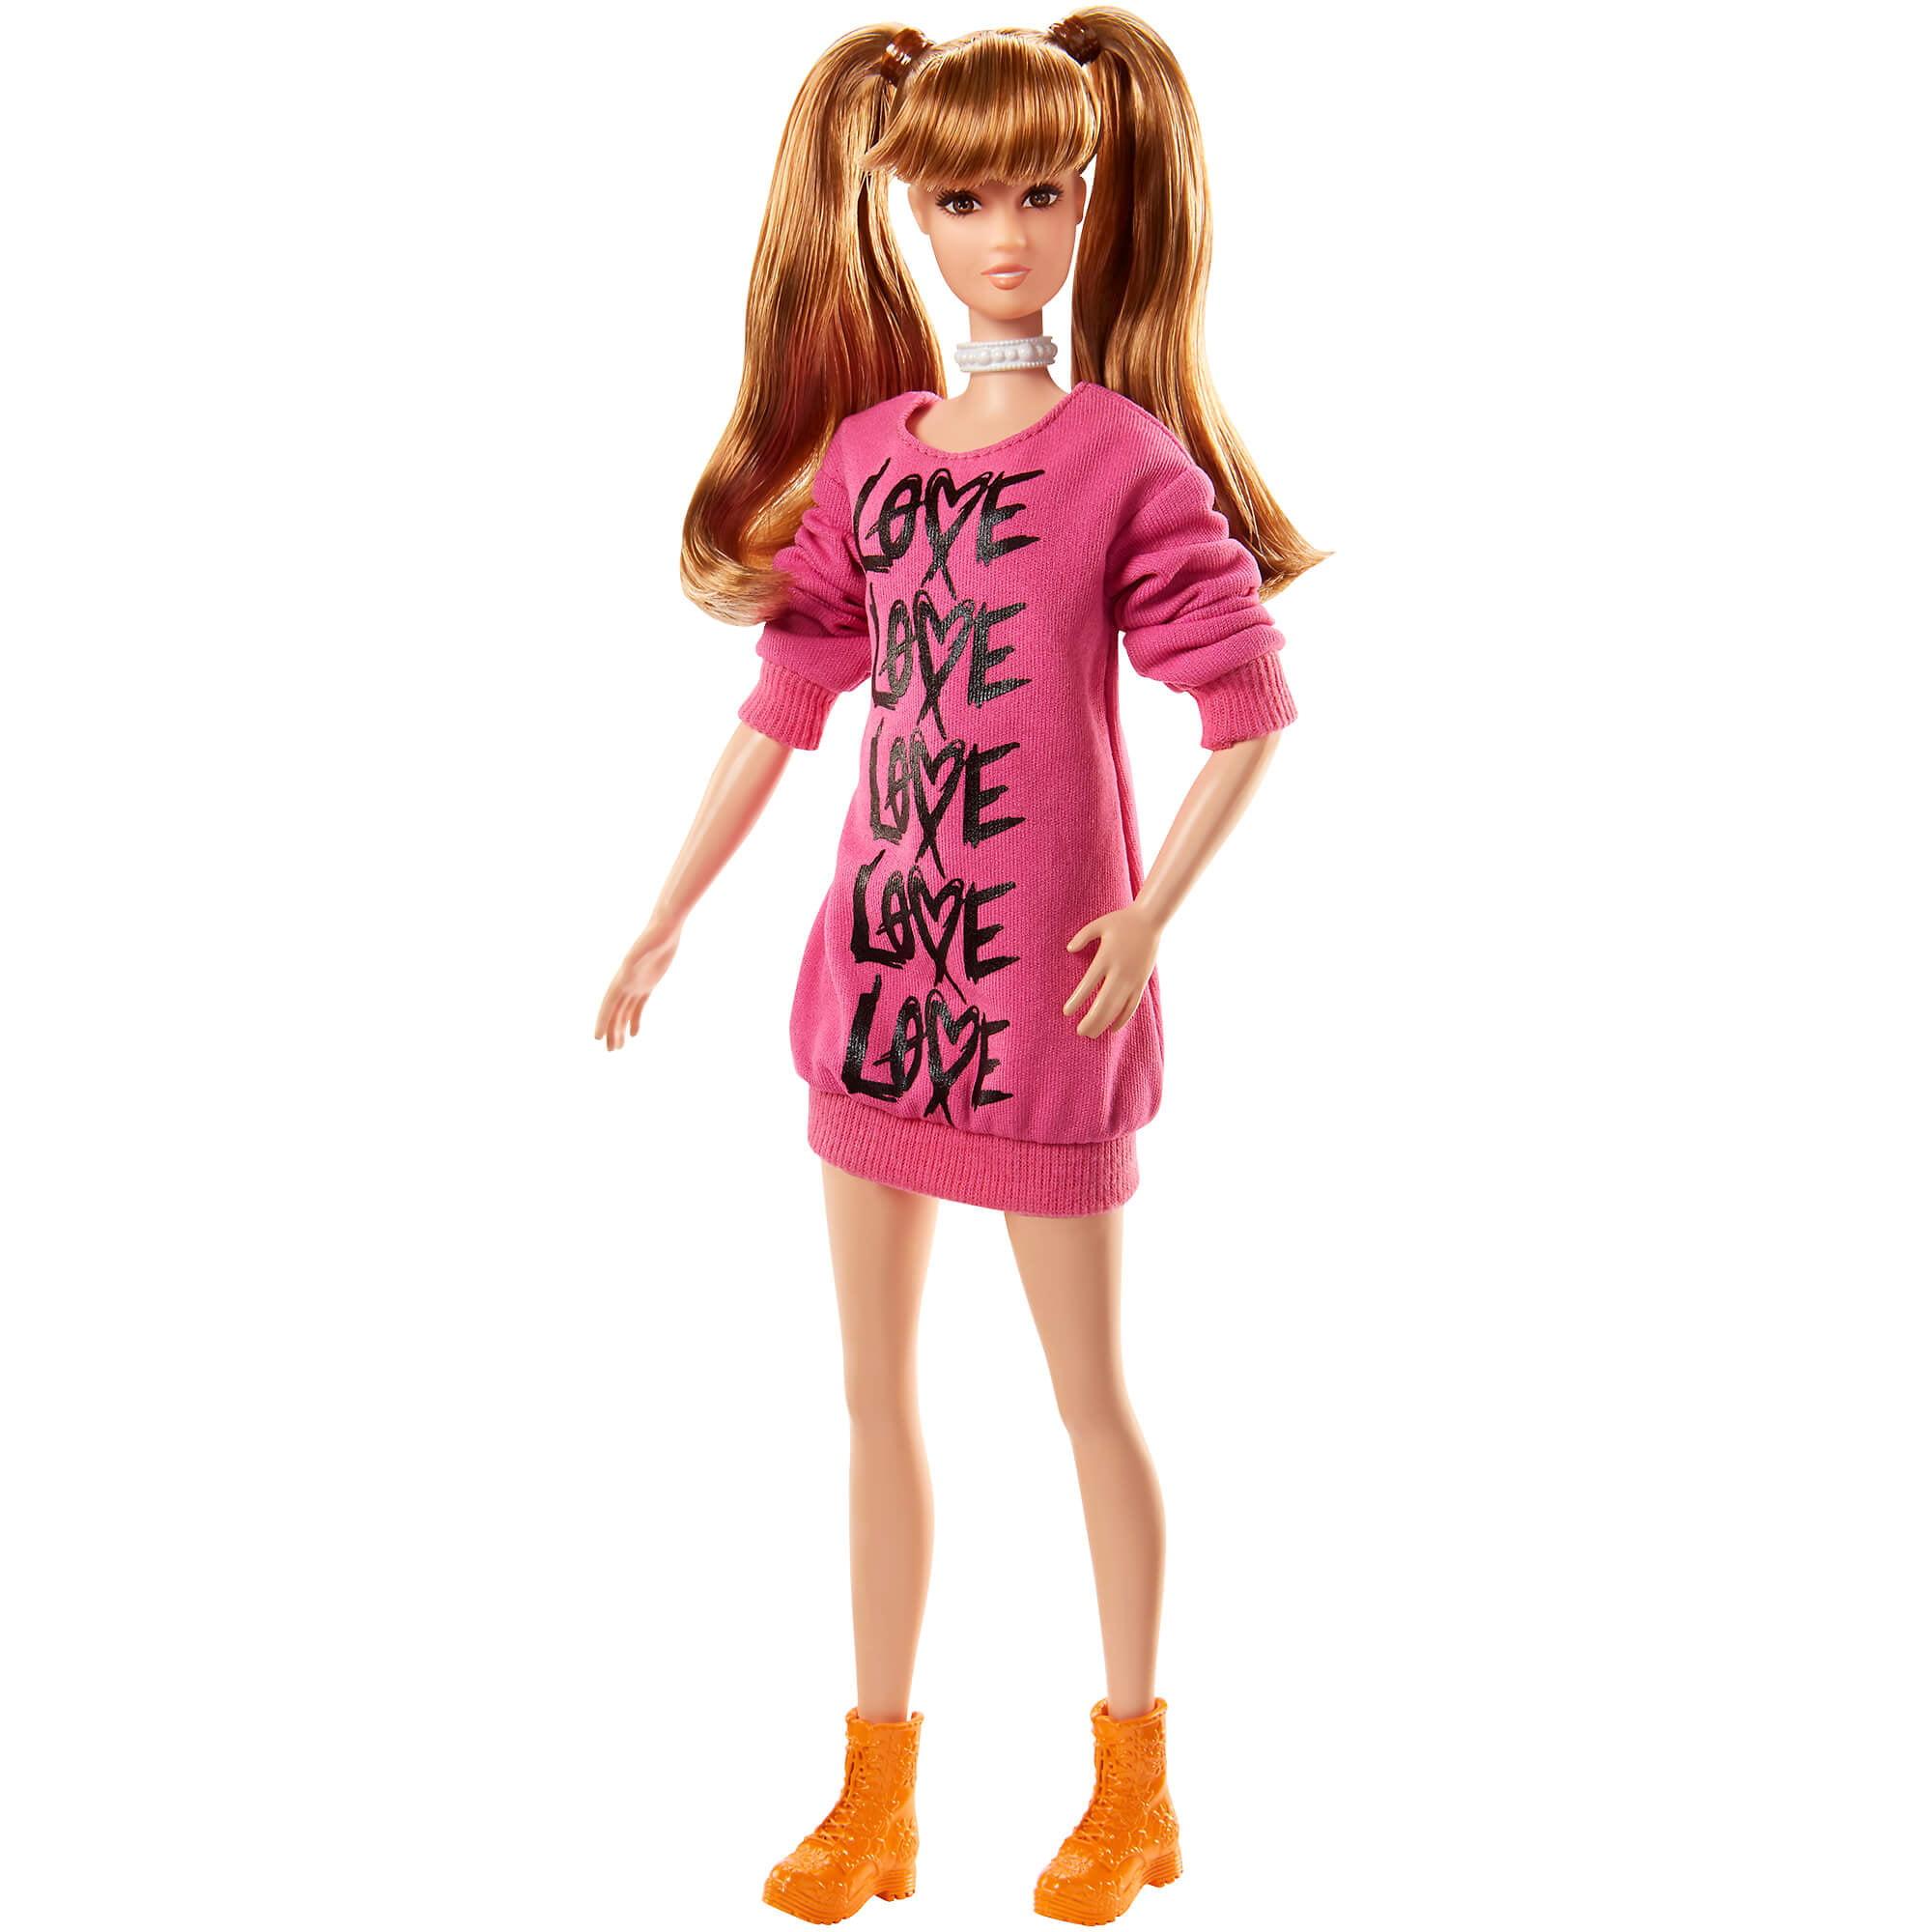 Barbie Fashionistas Dolls Wear Your Heart by Mattel